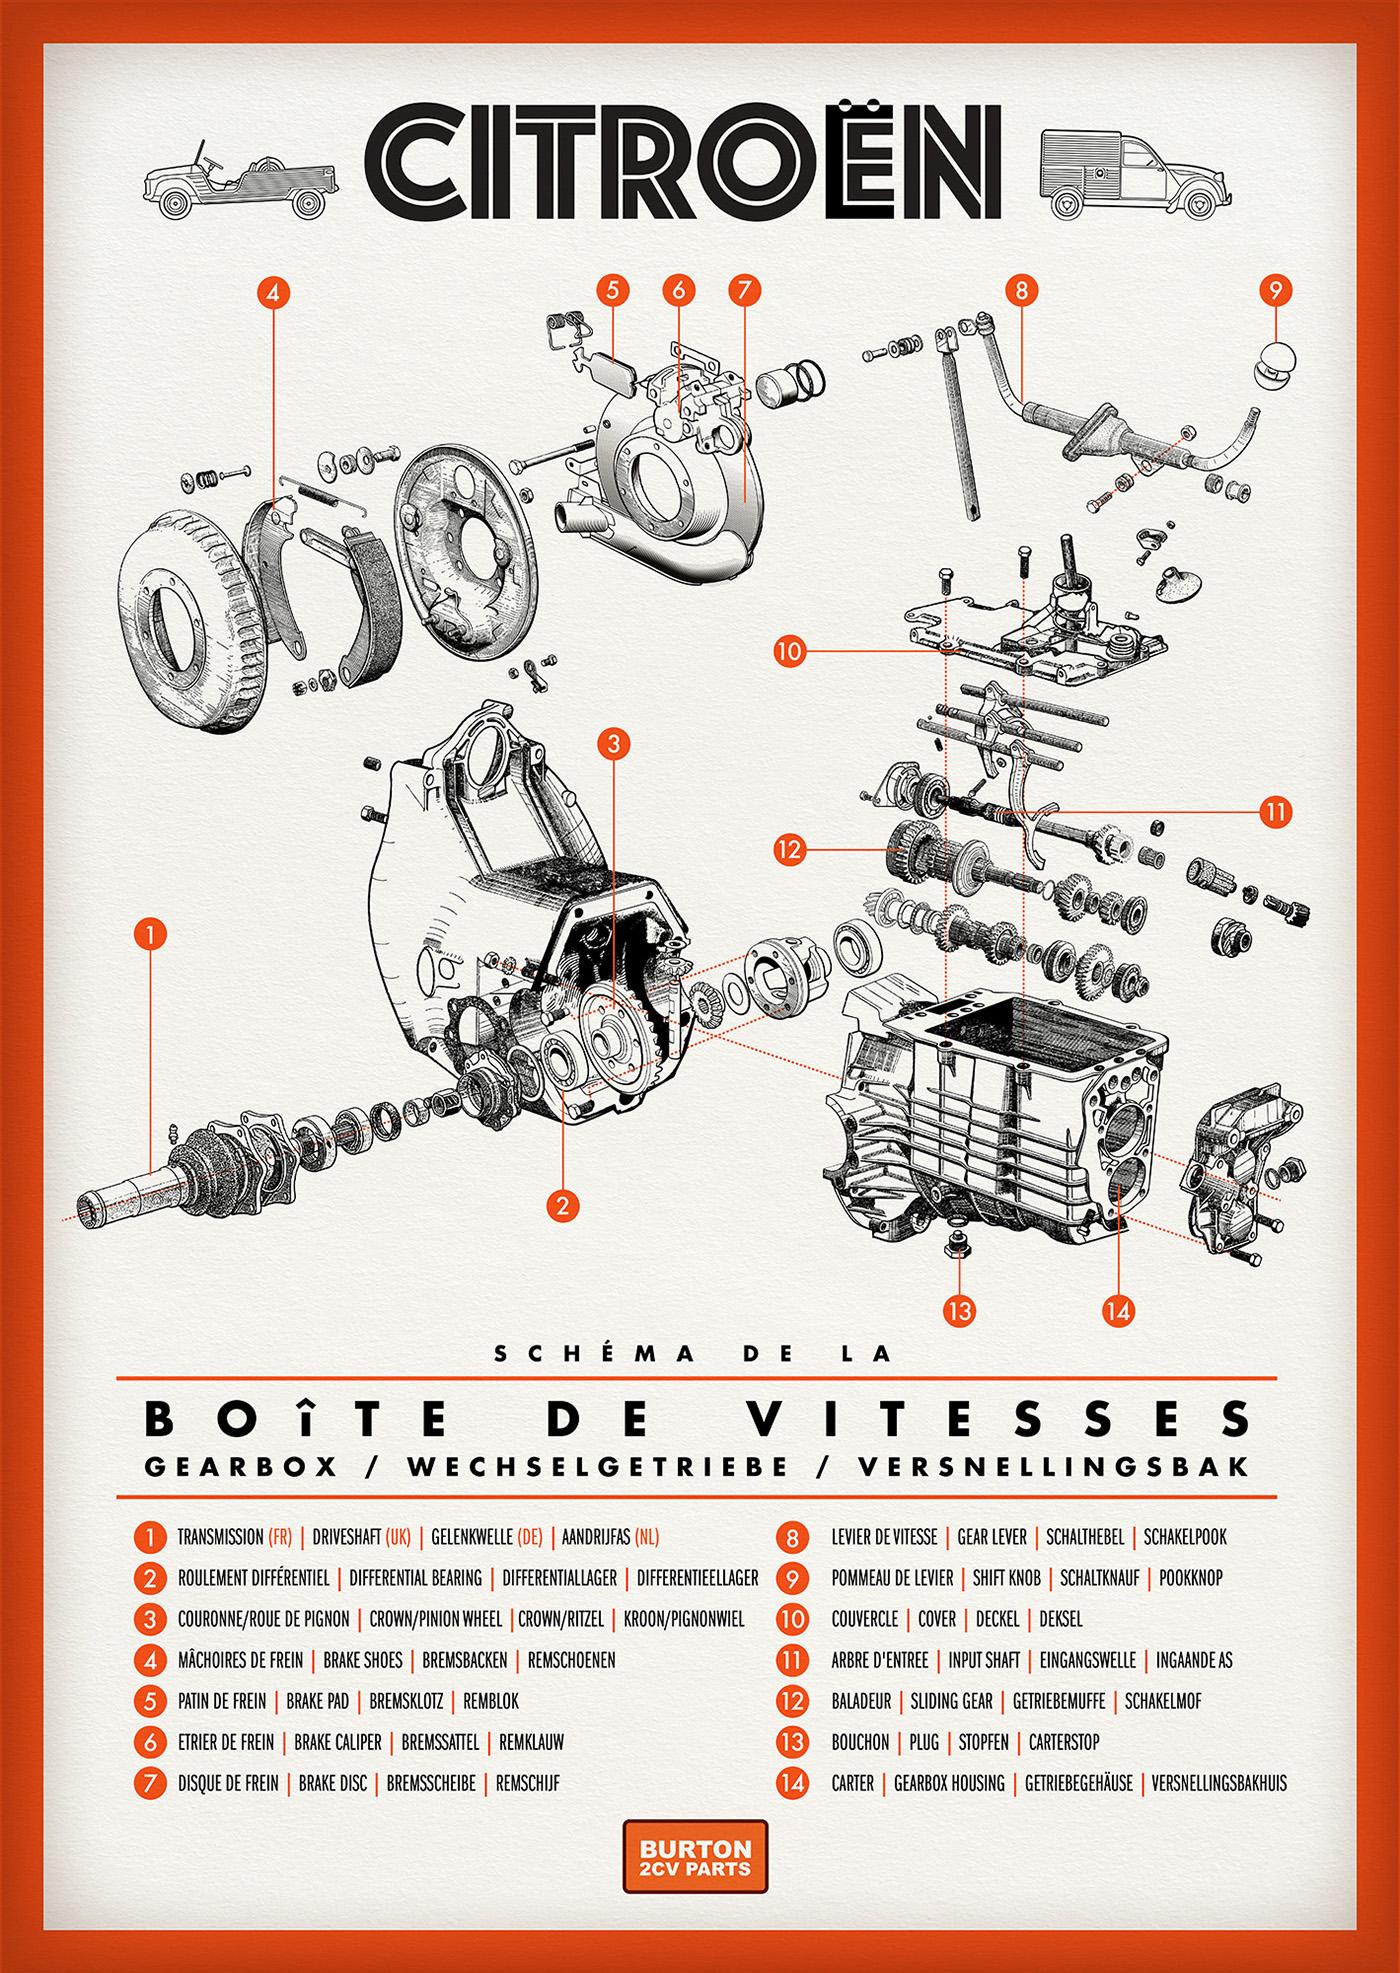 D d poster design - D D Poster Design 56